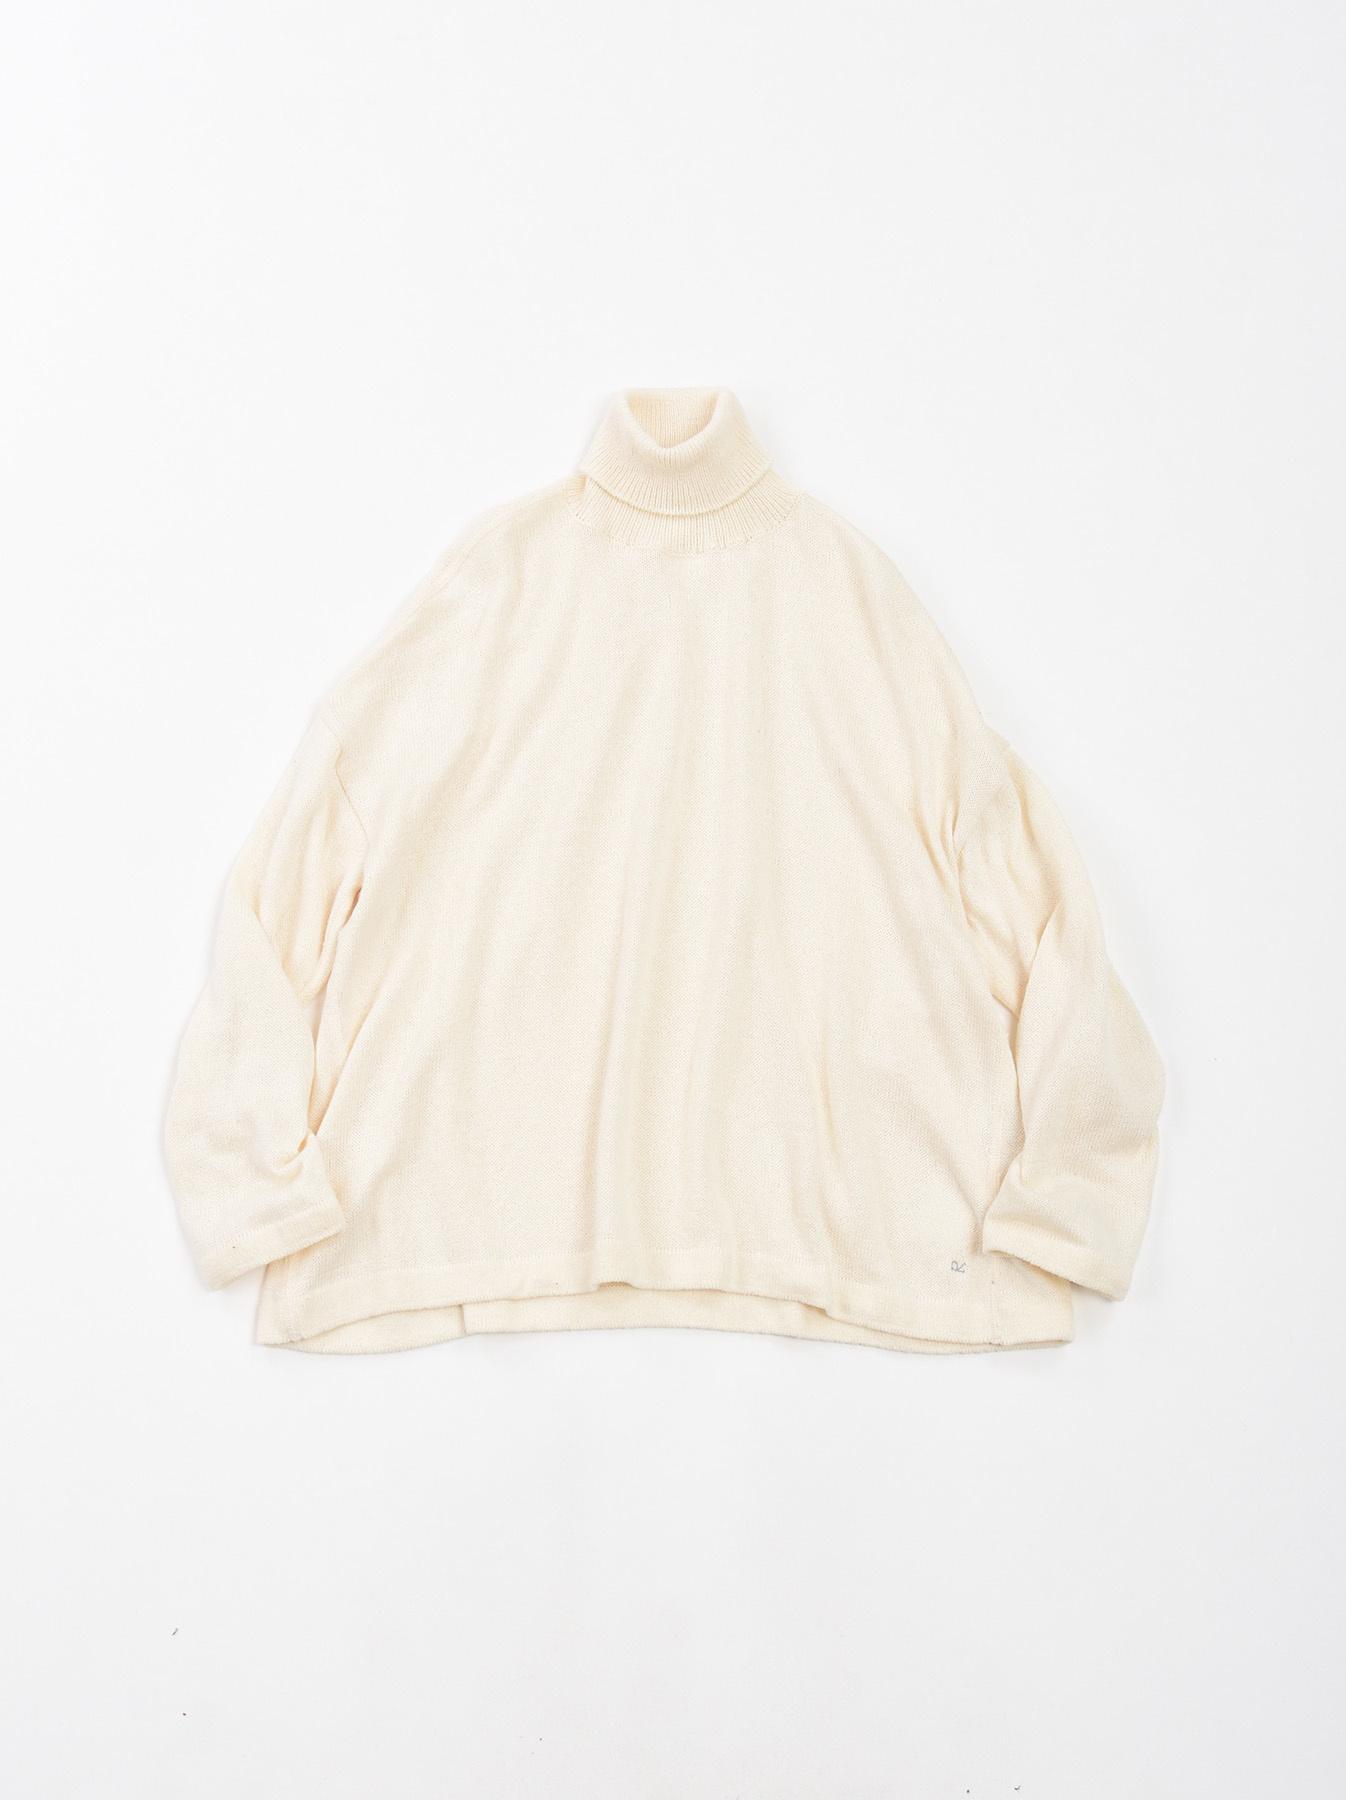 Zimbabwe Cotton Knit-sew Turtleneck-7